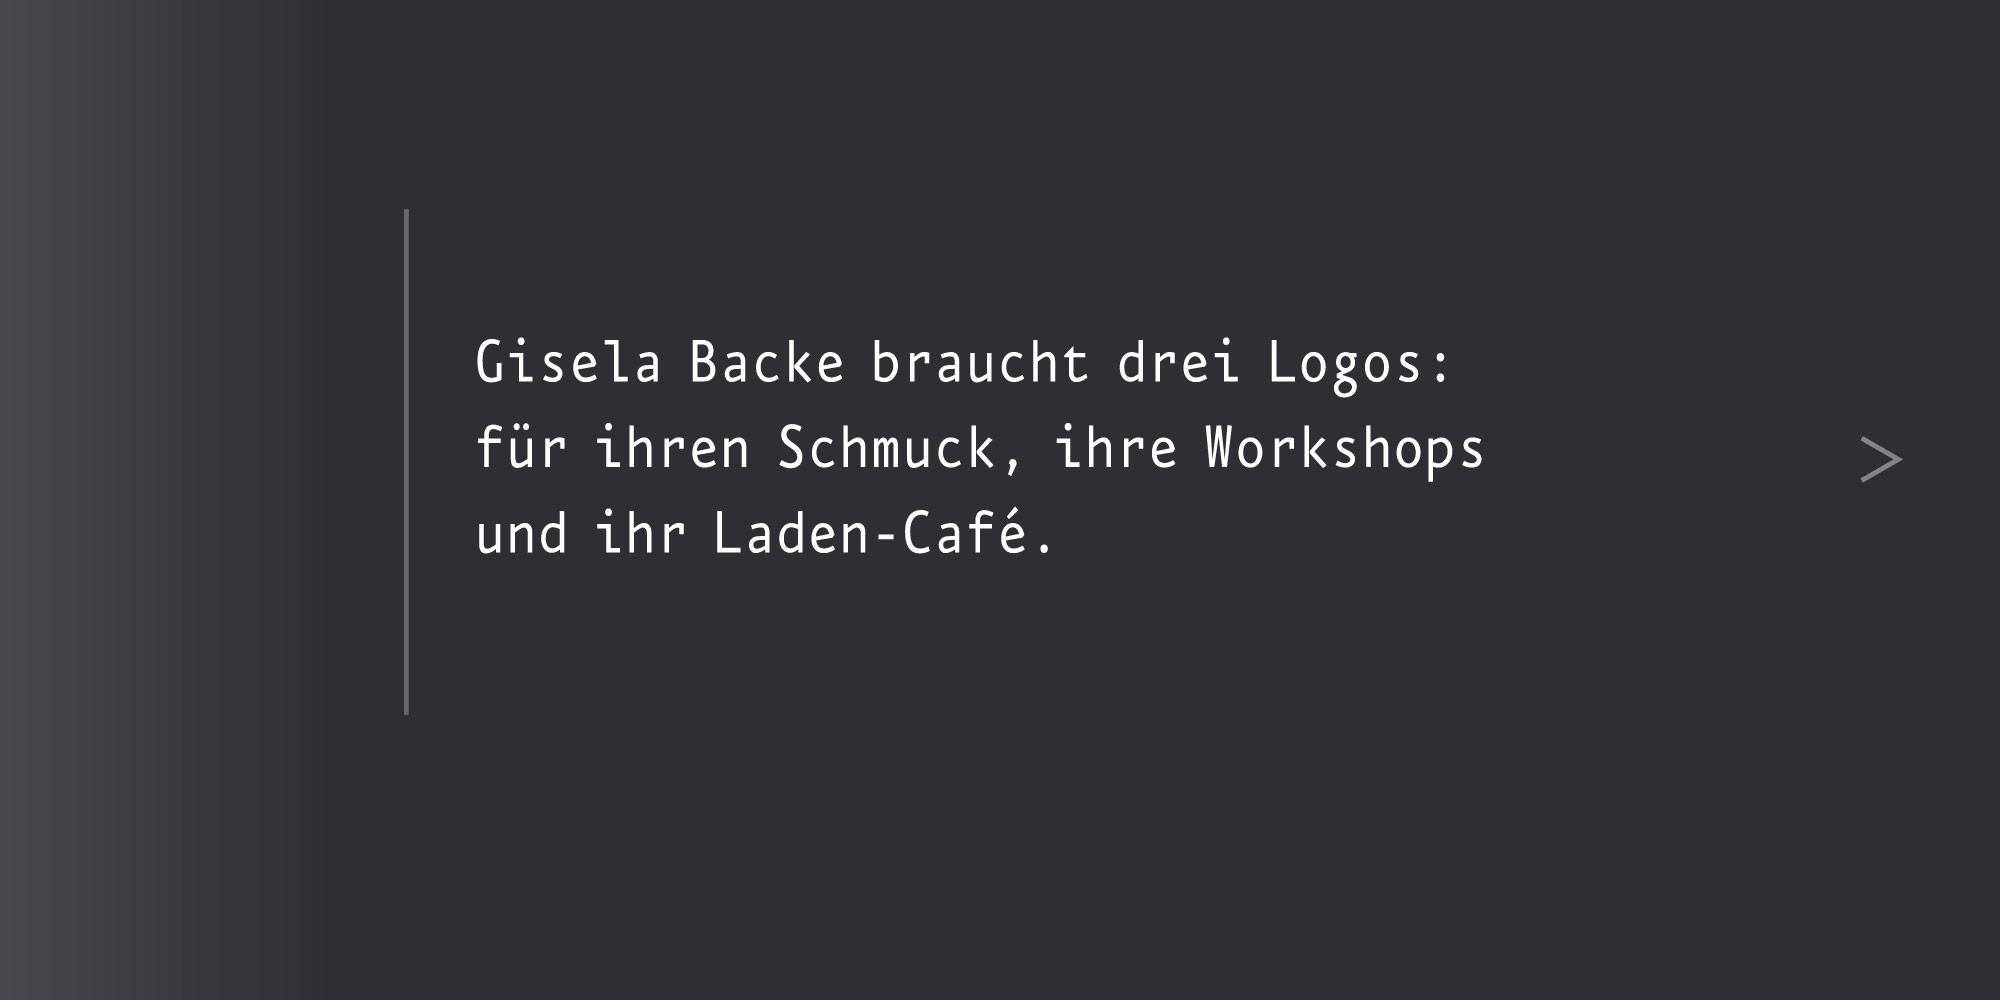 Marken-System Giselart Markensystem aus drei Logos